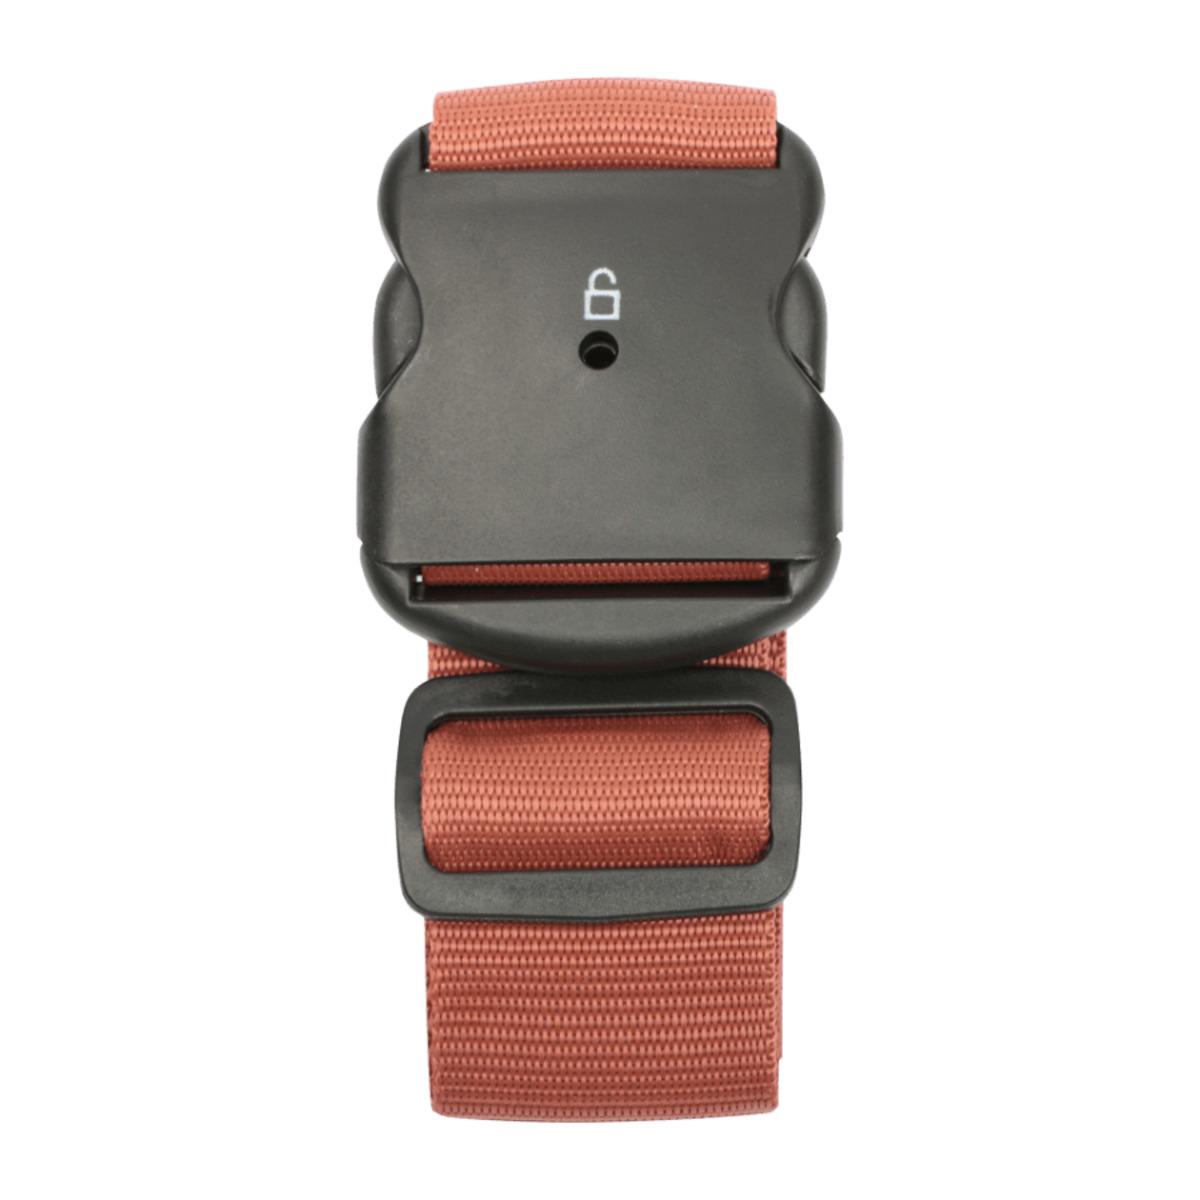 Bild 2 von ROYAL LIFE     Koffer-Zahlenschloss / Koffergurt-Set